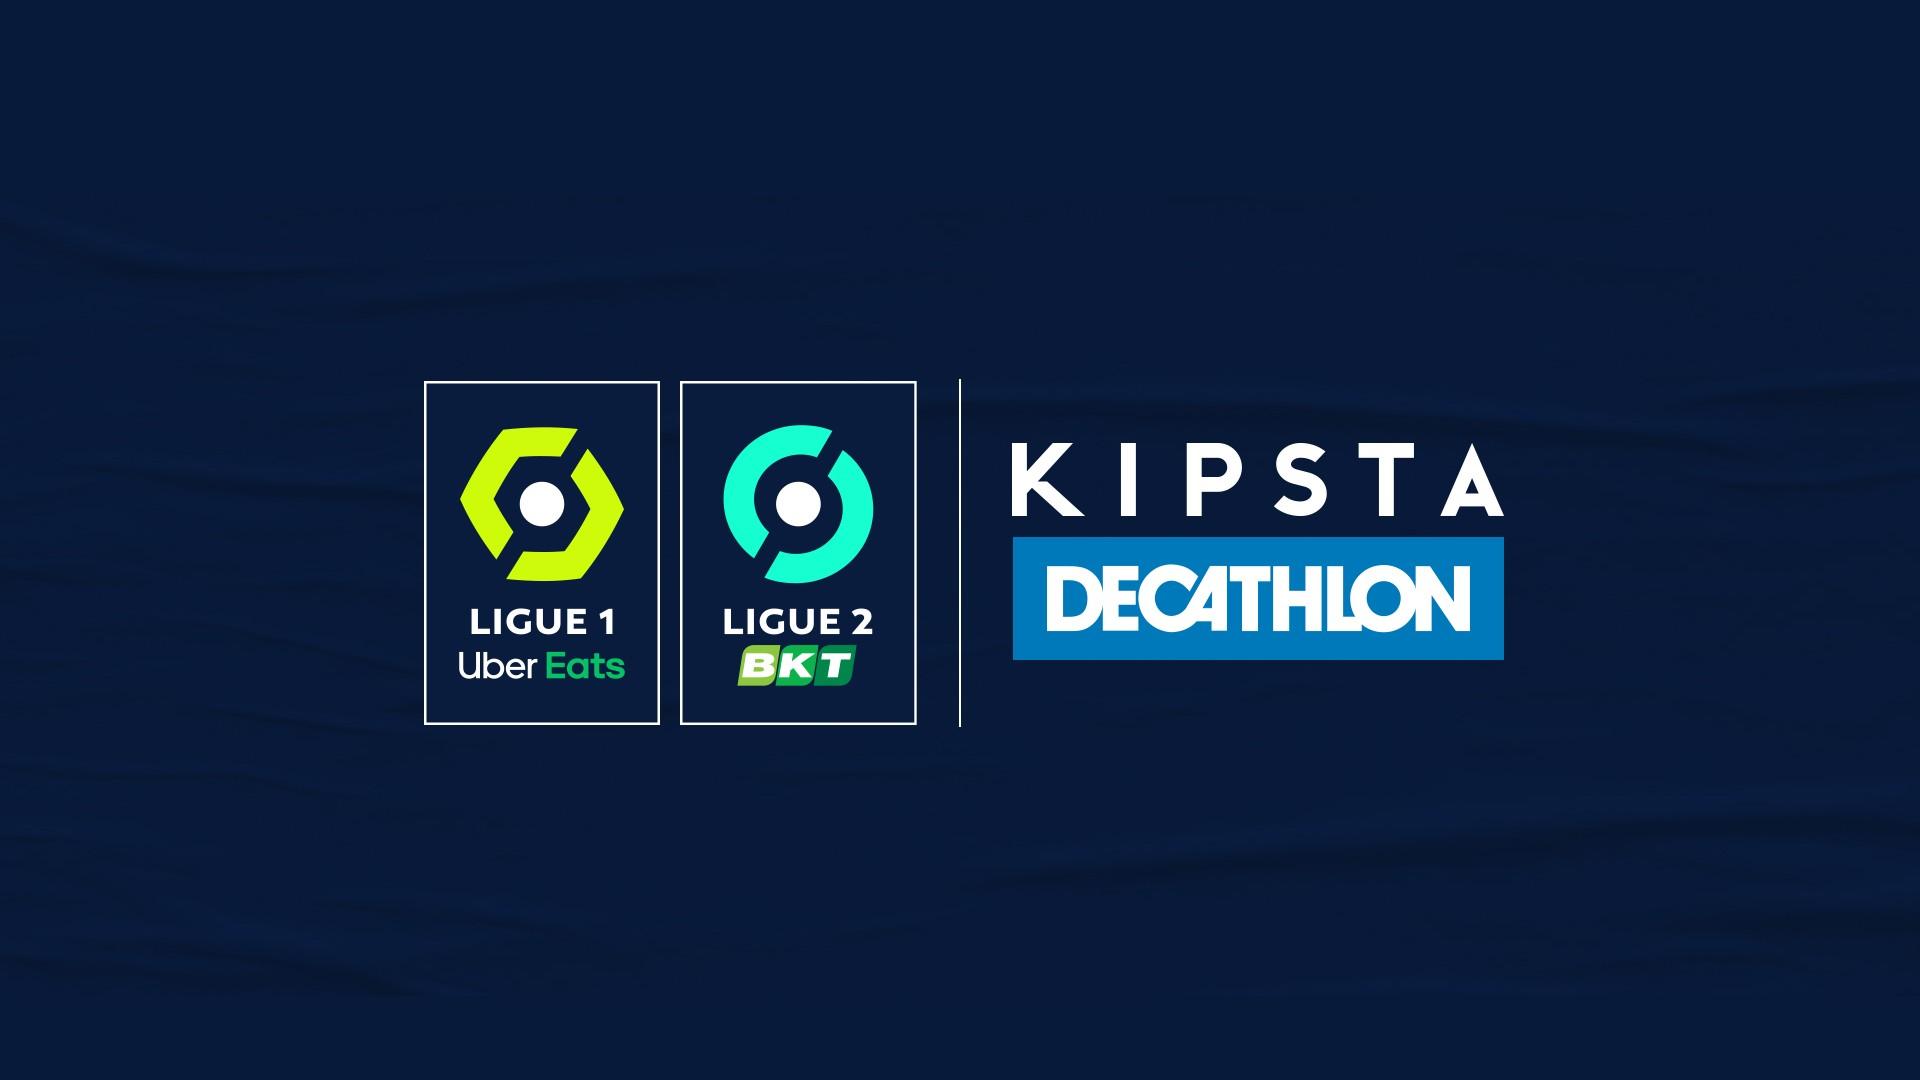 Kipsta (Decathlon) x LFP (football) 2021